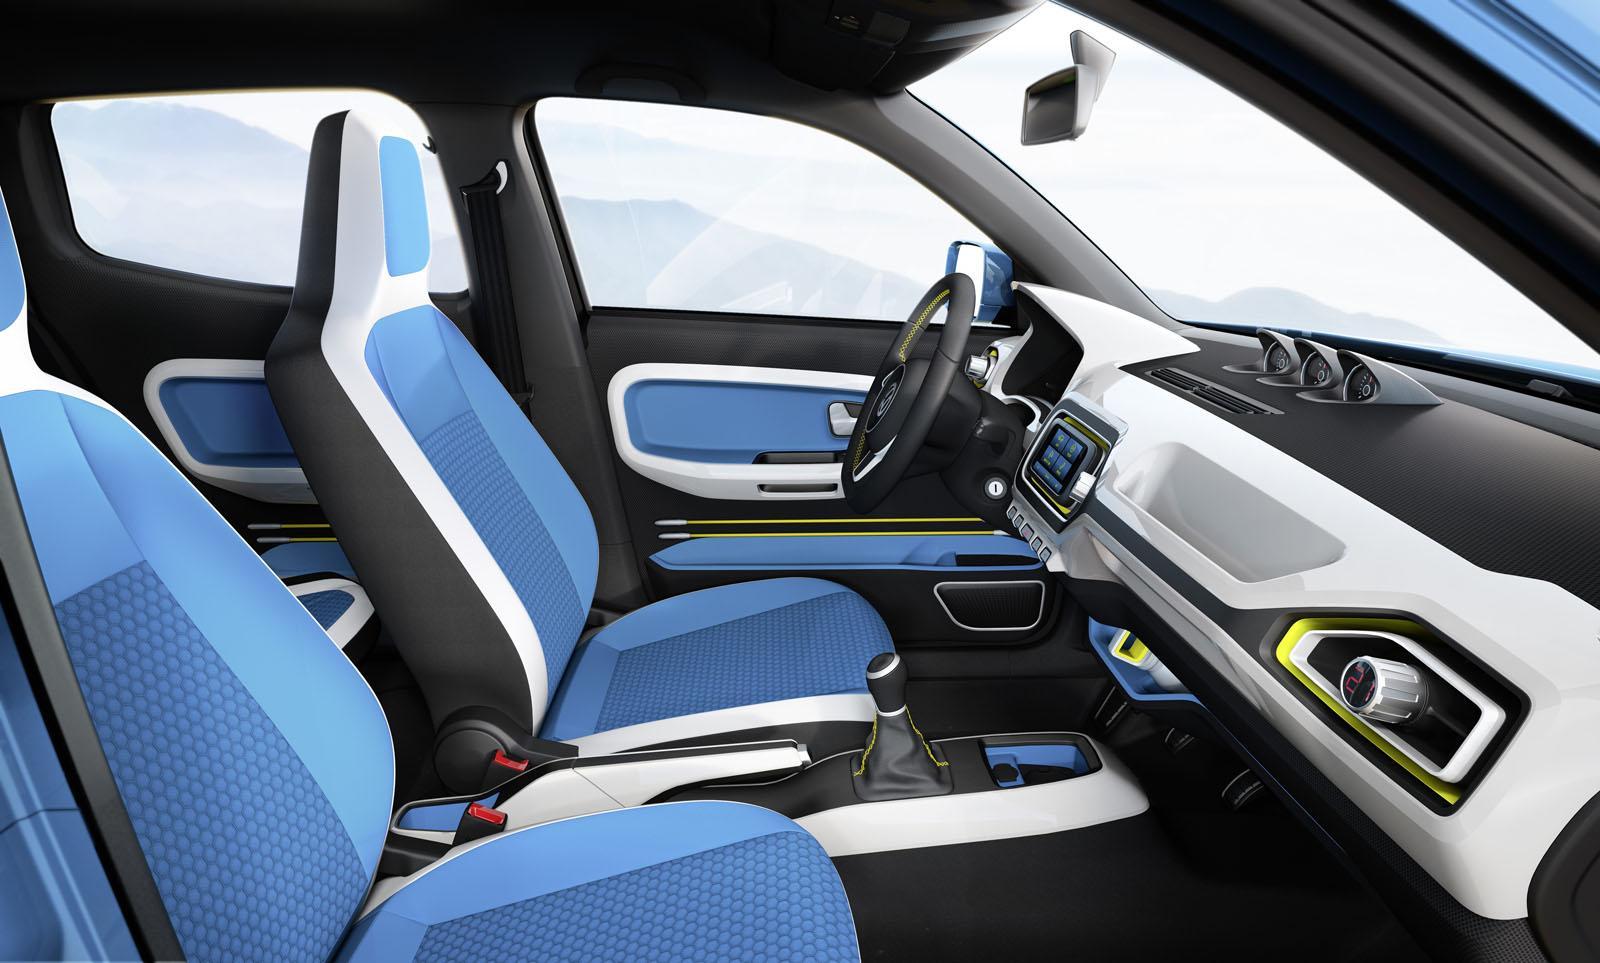 Nissan extrem concept pheonix m6 nissan extrem concept vanachro Gallery